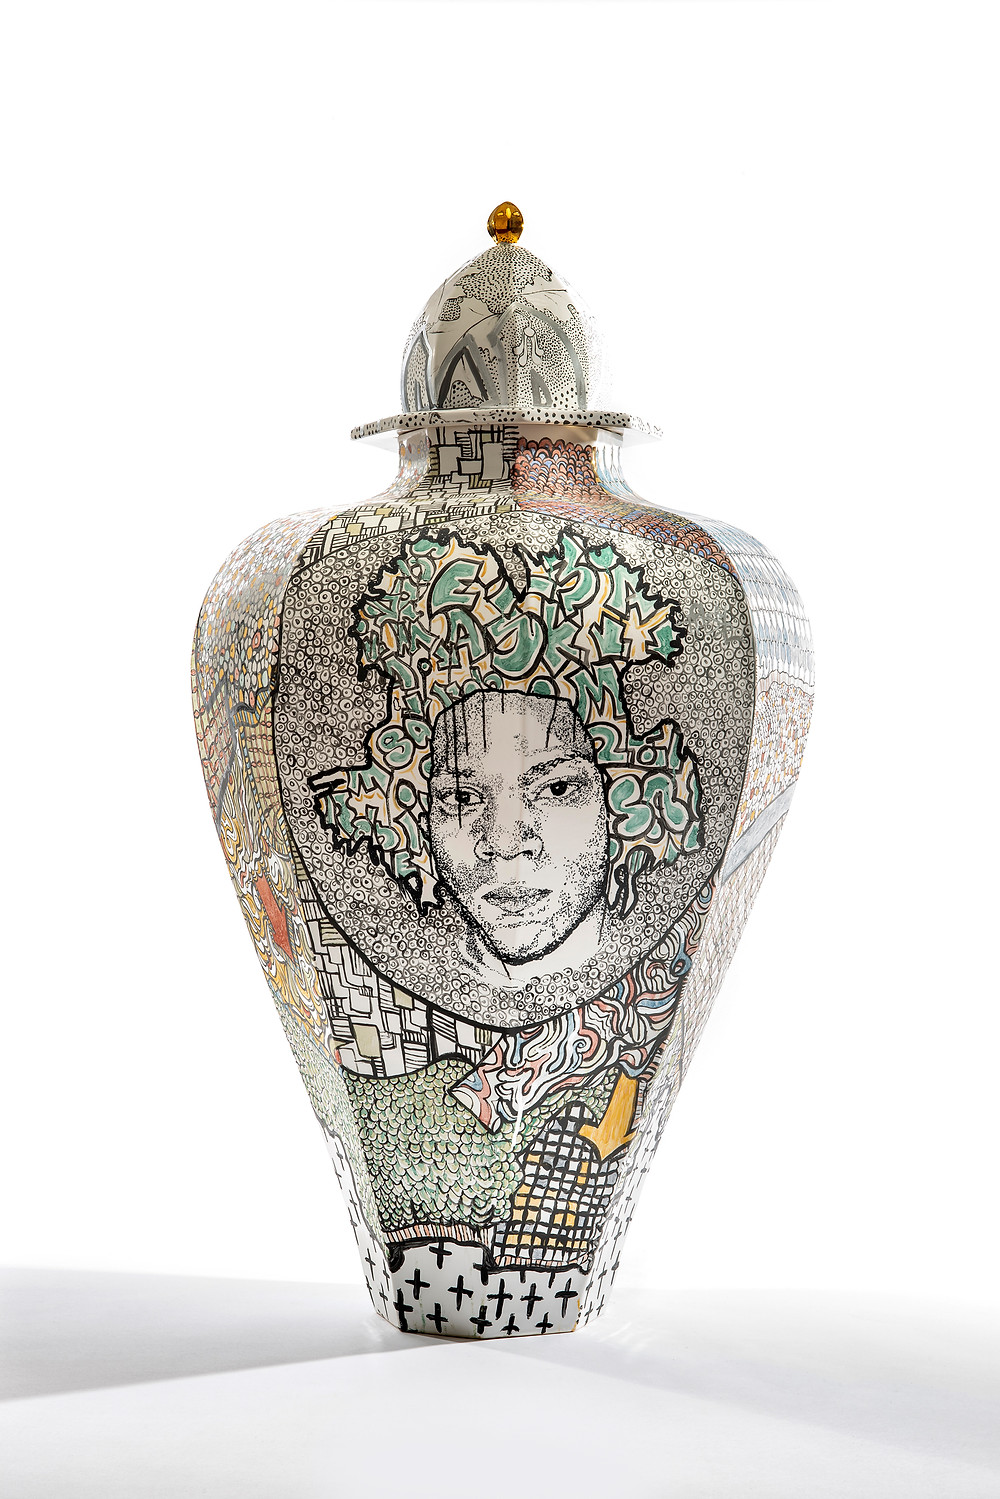 Decorative urn. Same Ol' Crack: Roberto Lugo, 2019: Courtesy of Wexler Gallery